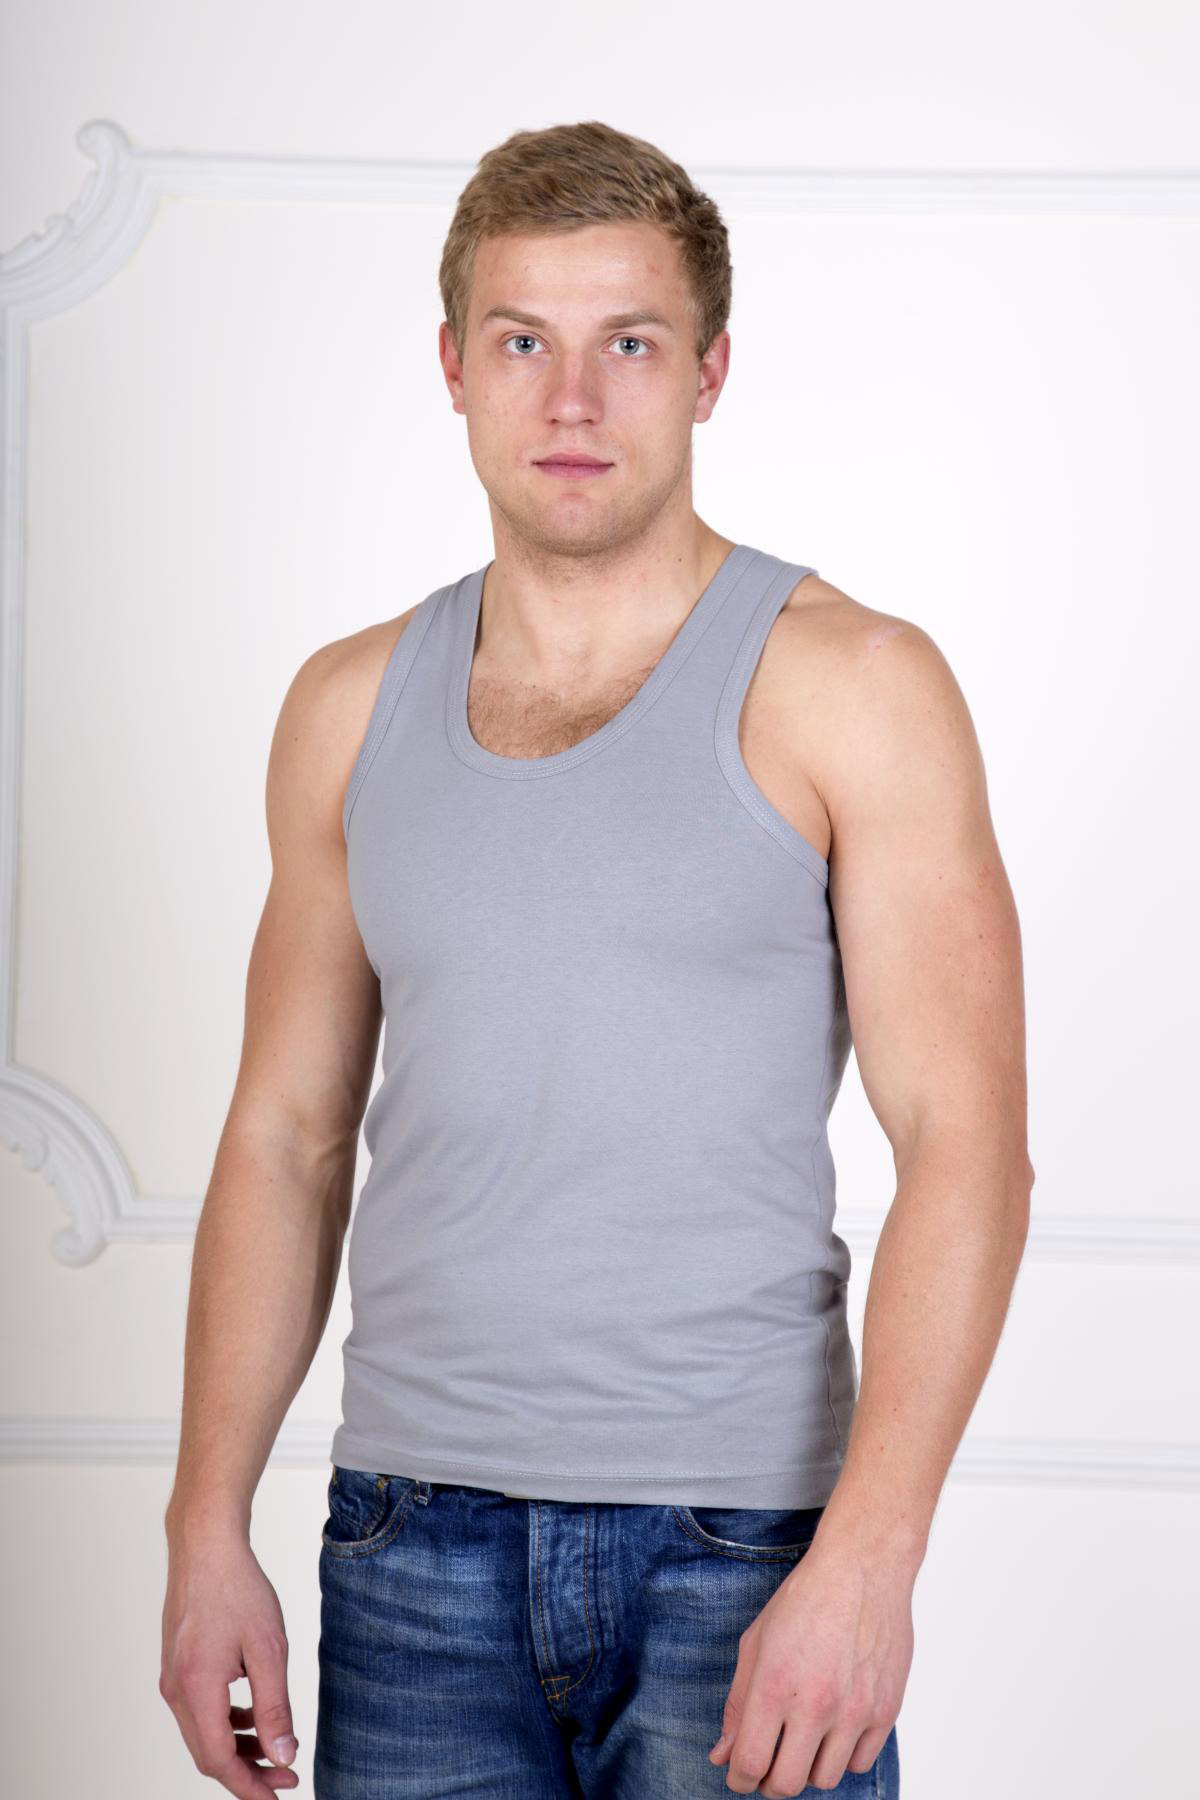 Муж. майка Верн Серый р. 54Майки и футболки<br>Факт. ОГ: 100 см <br>Факт. ОТ: 96 см <br>Факт. ОБ: 100 см <br>Длина по спинке: 77 см<br><br>Тип: Муж. майка<br>Размер: 54<br>Материал: Кулирка